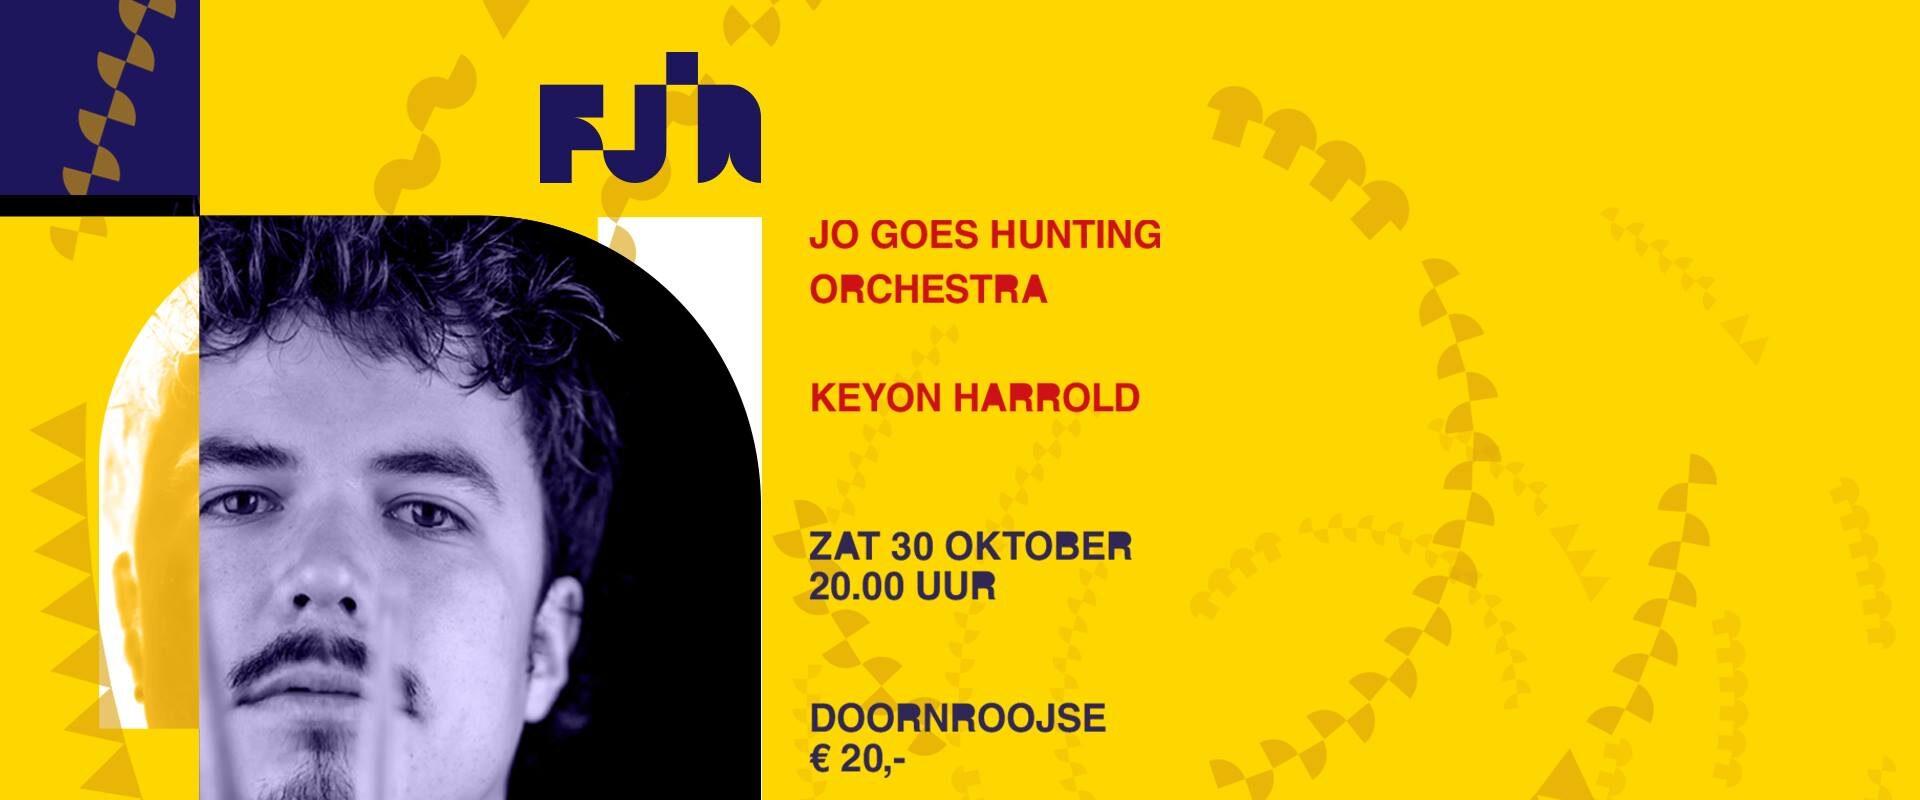 FJIN 2021 • Jo Goes Hunting Orchestra • Keyon Harrold 2